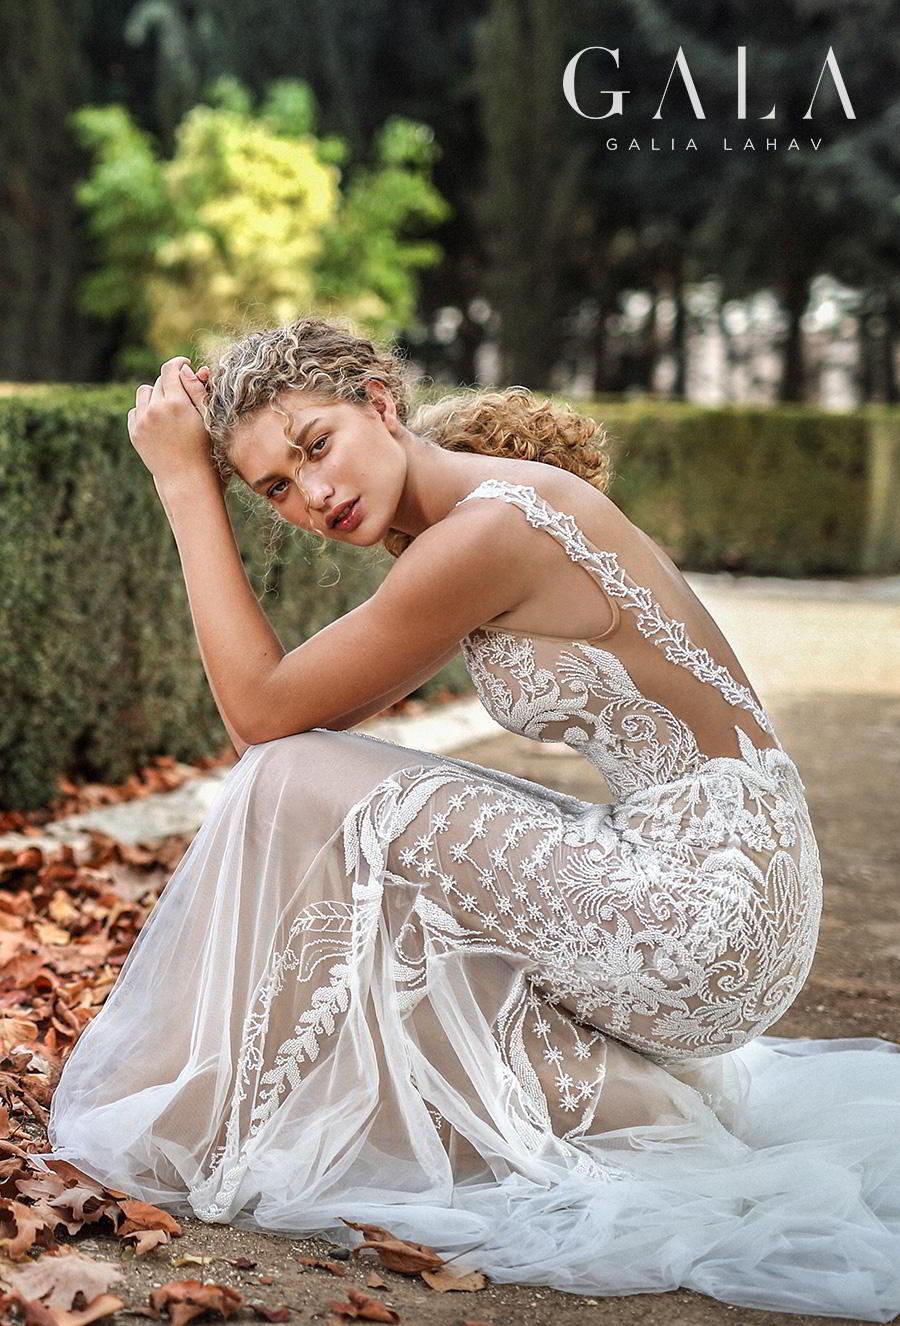 galia lahav gala fall 2019 bridal spaghetti strap deep plunging v neck full embellishment elegant glamorous lace fit and flare mermaid wedding dress backless scoop back medium train (212) zsdv